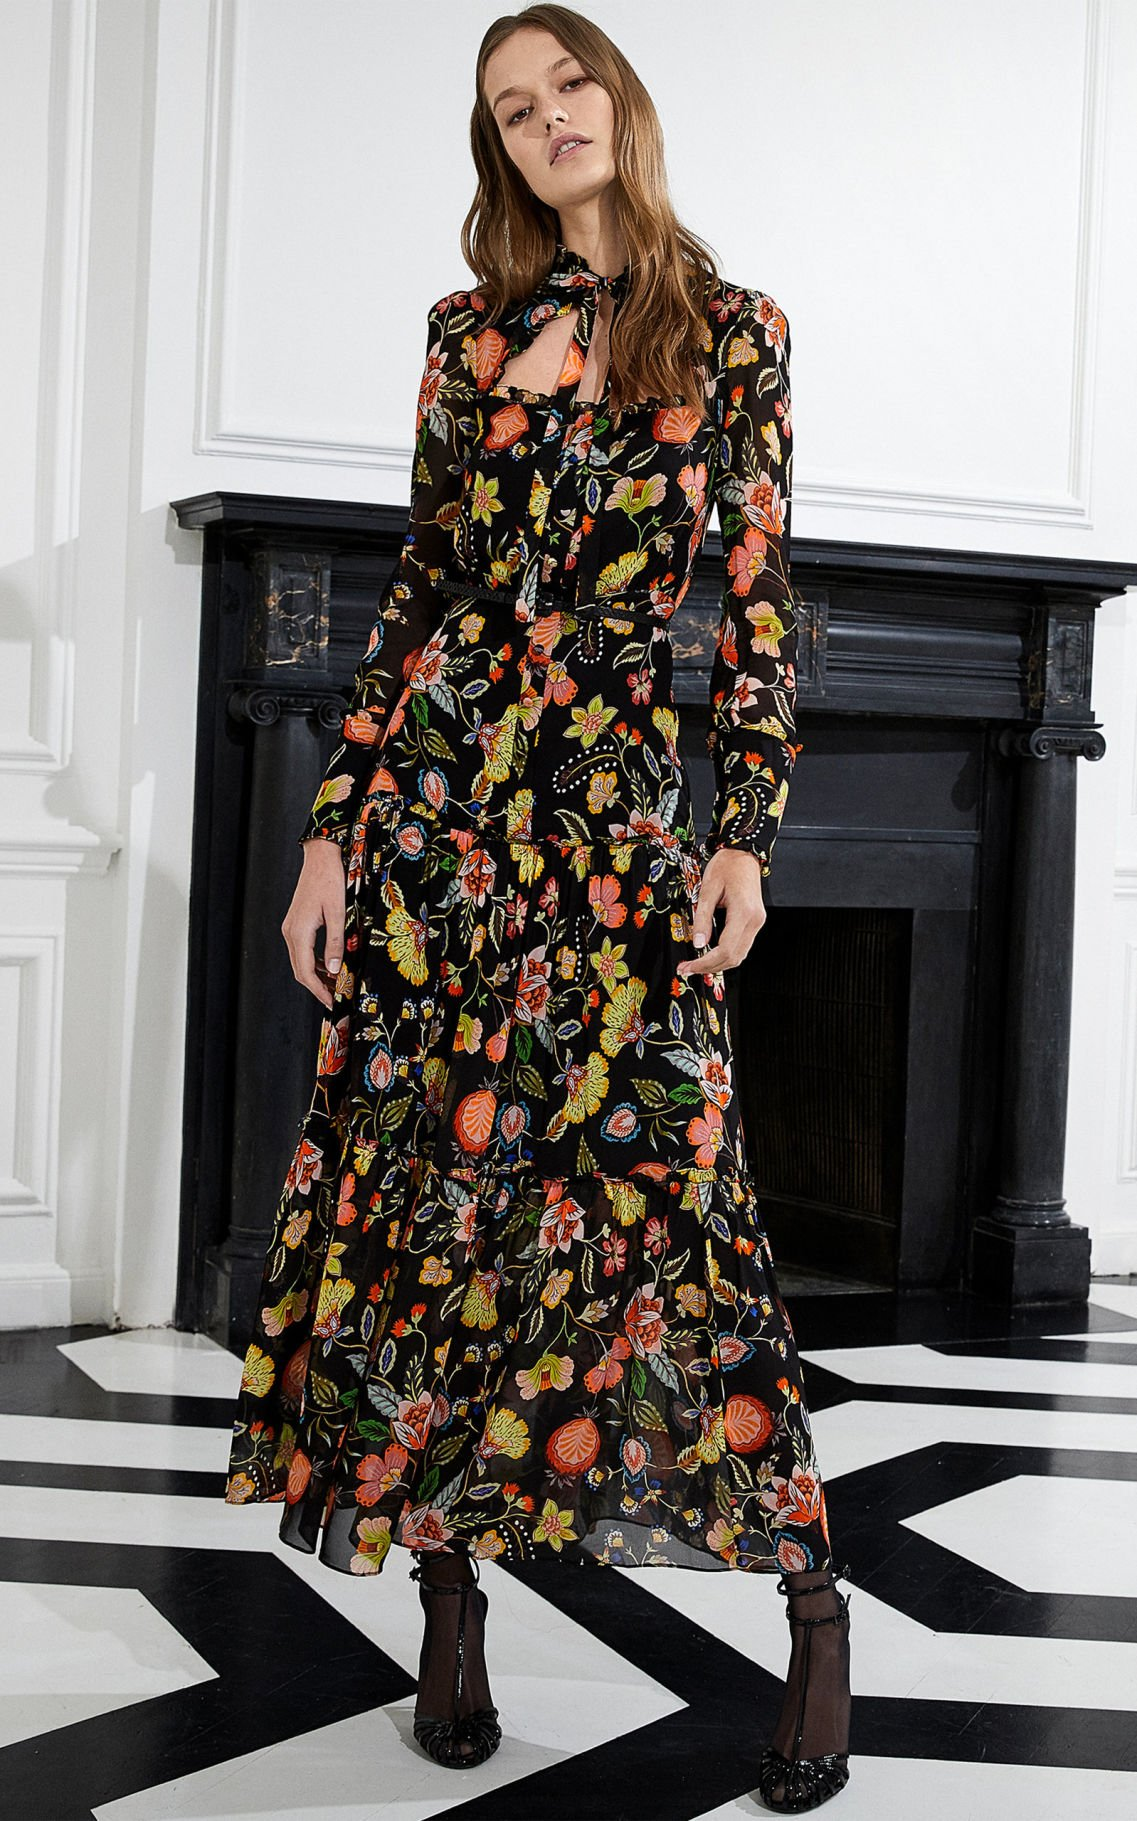 alexis-floral-sabryna-ruffle-tiered-floral-print-midi-dress $595 Moda Operandi.jpg